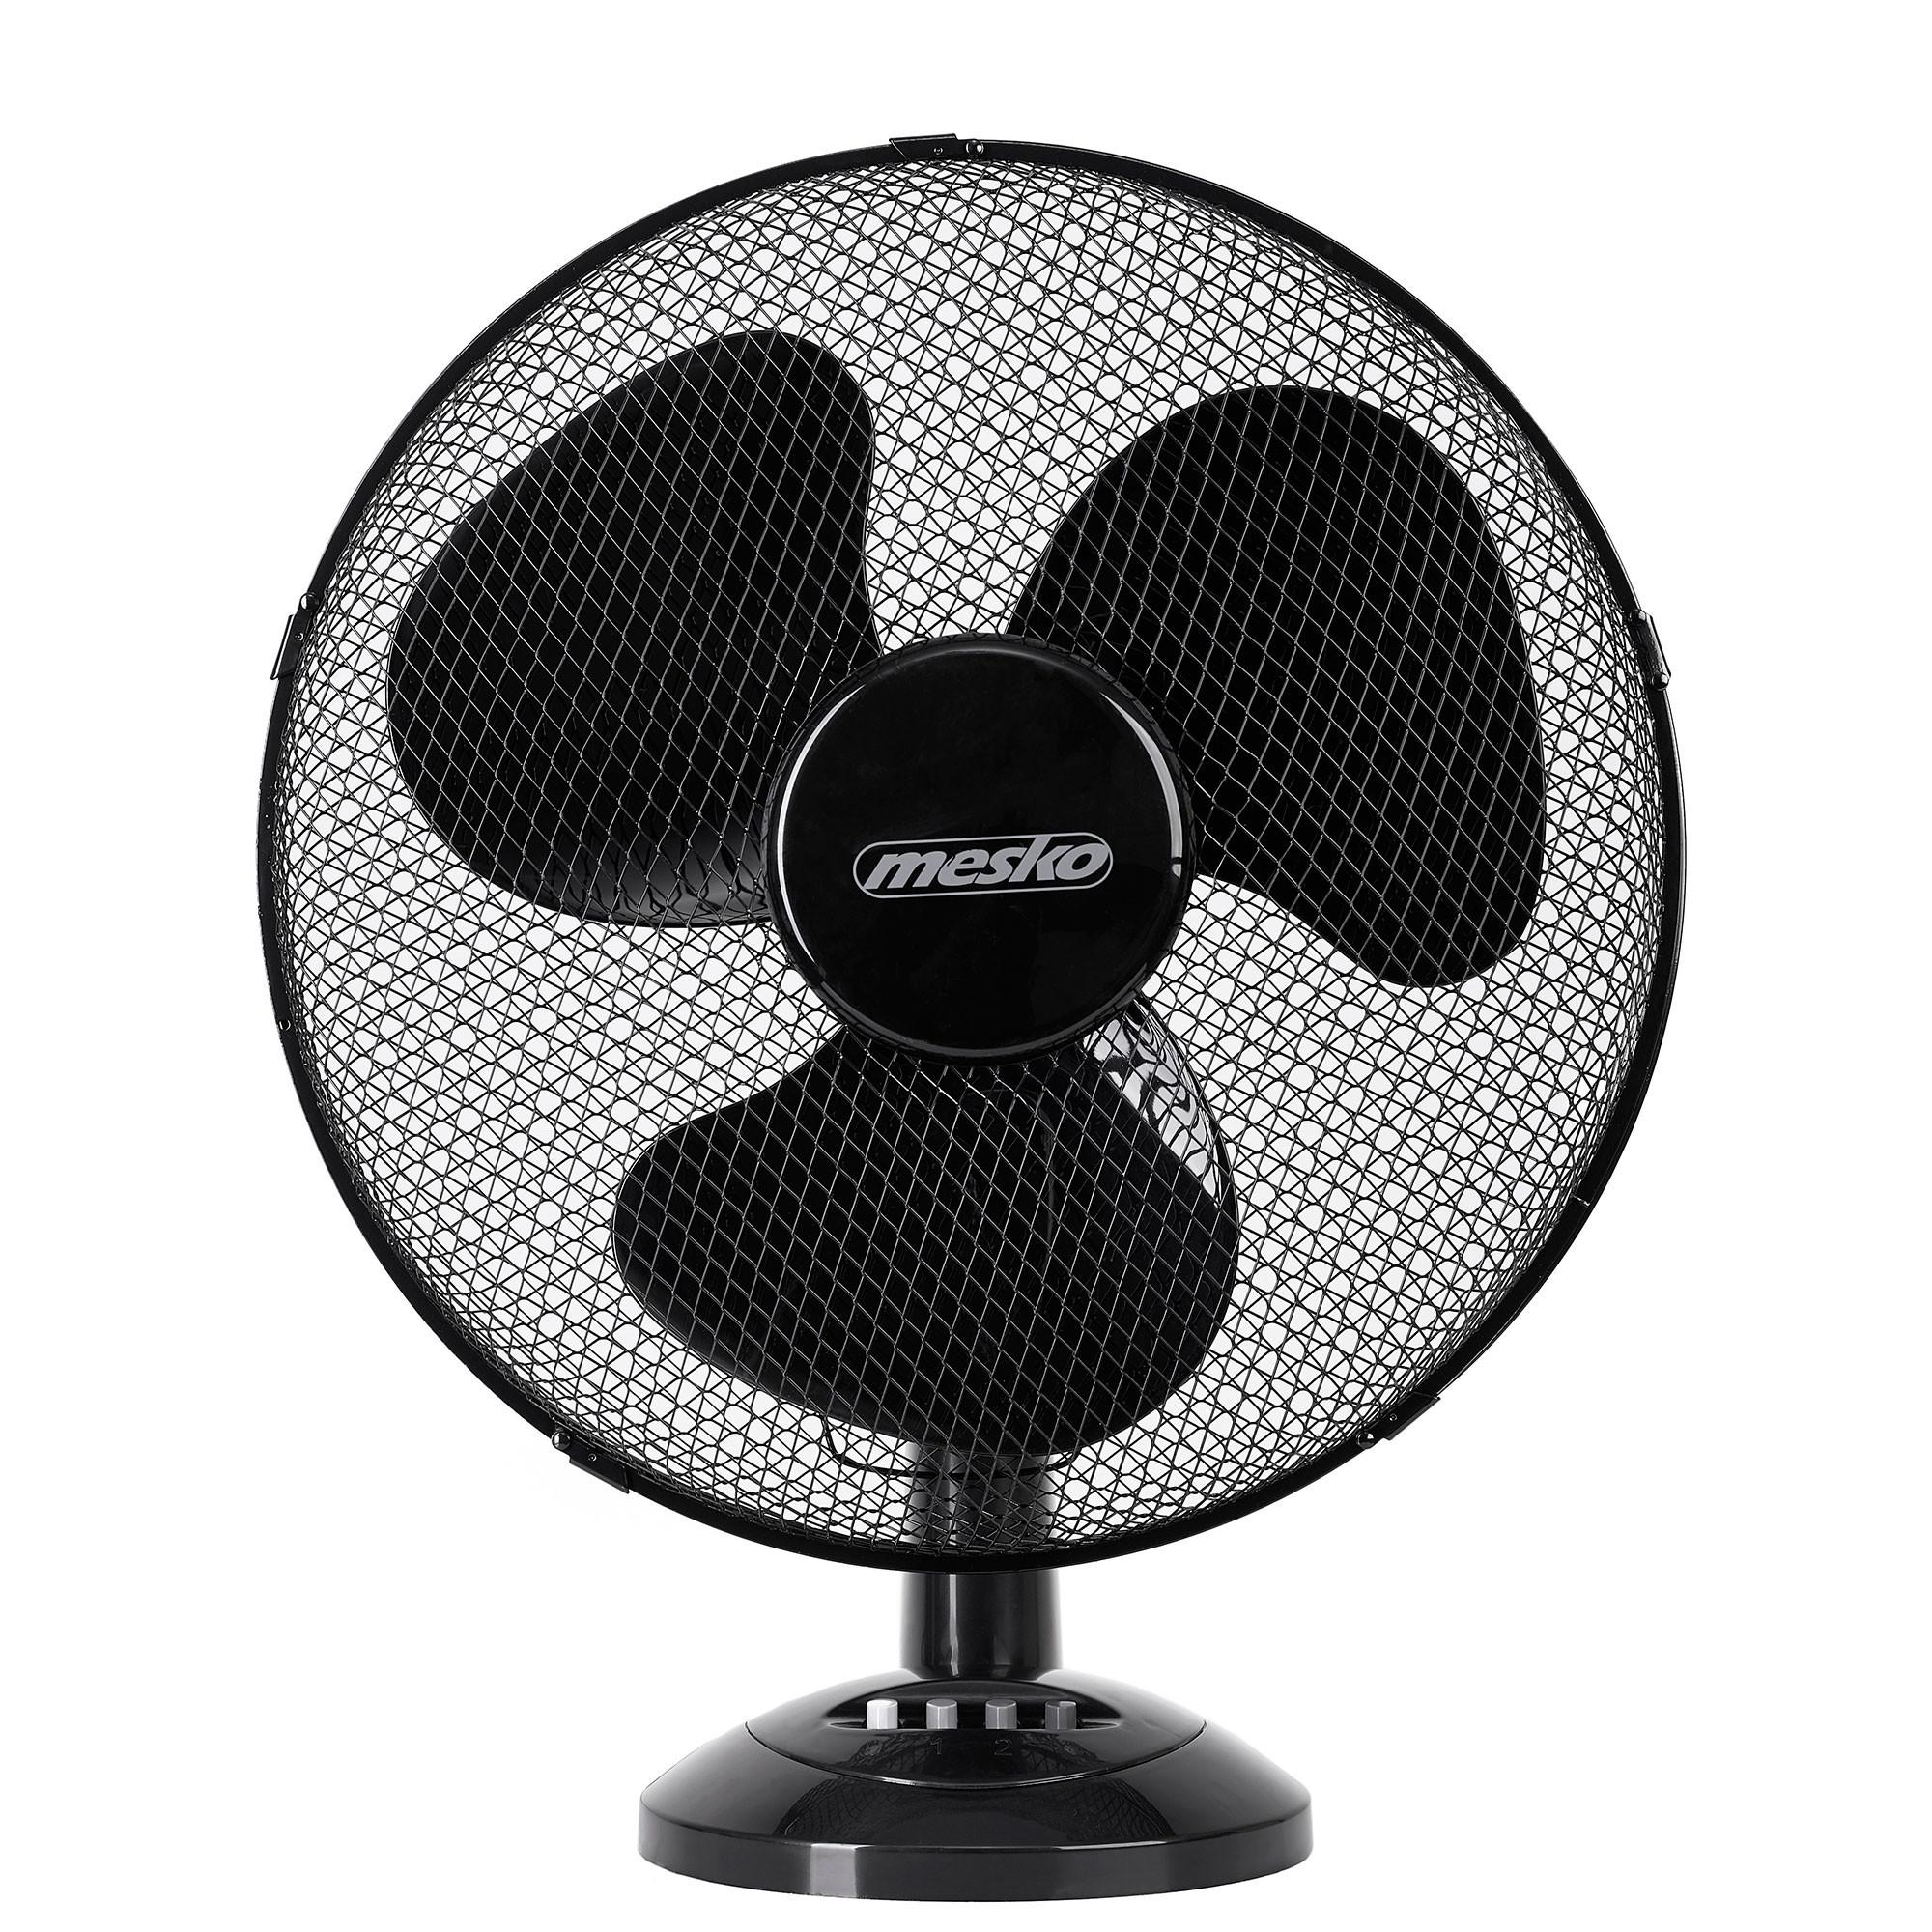 Mesko MS 7308 - Ventilador portátil de sobremesa oscilante, 2 velocidades, 23cm, negro, 45W